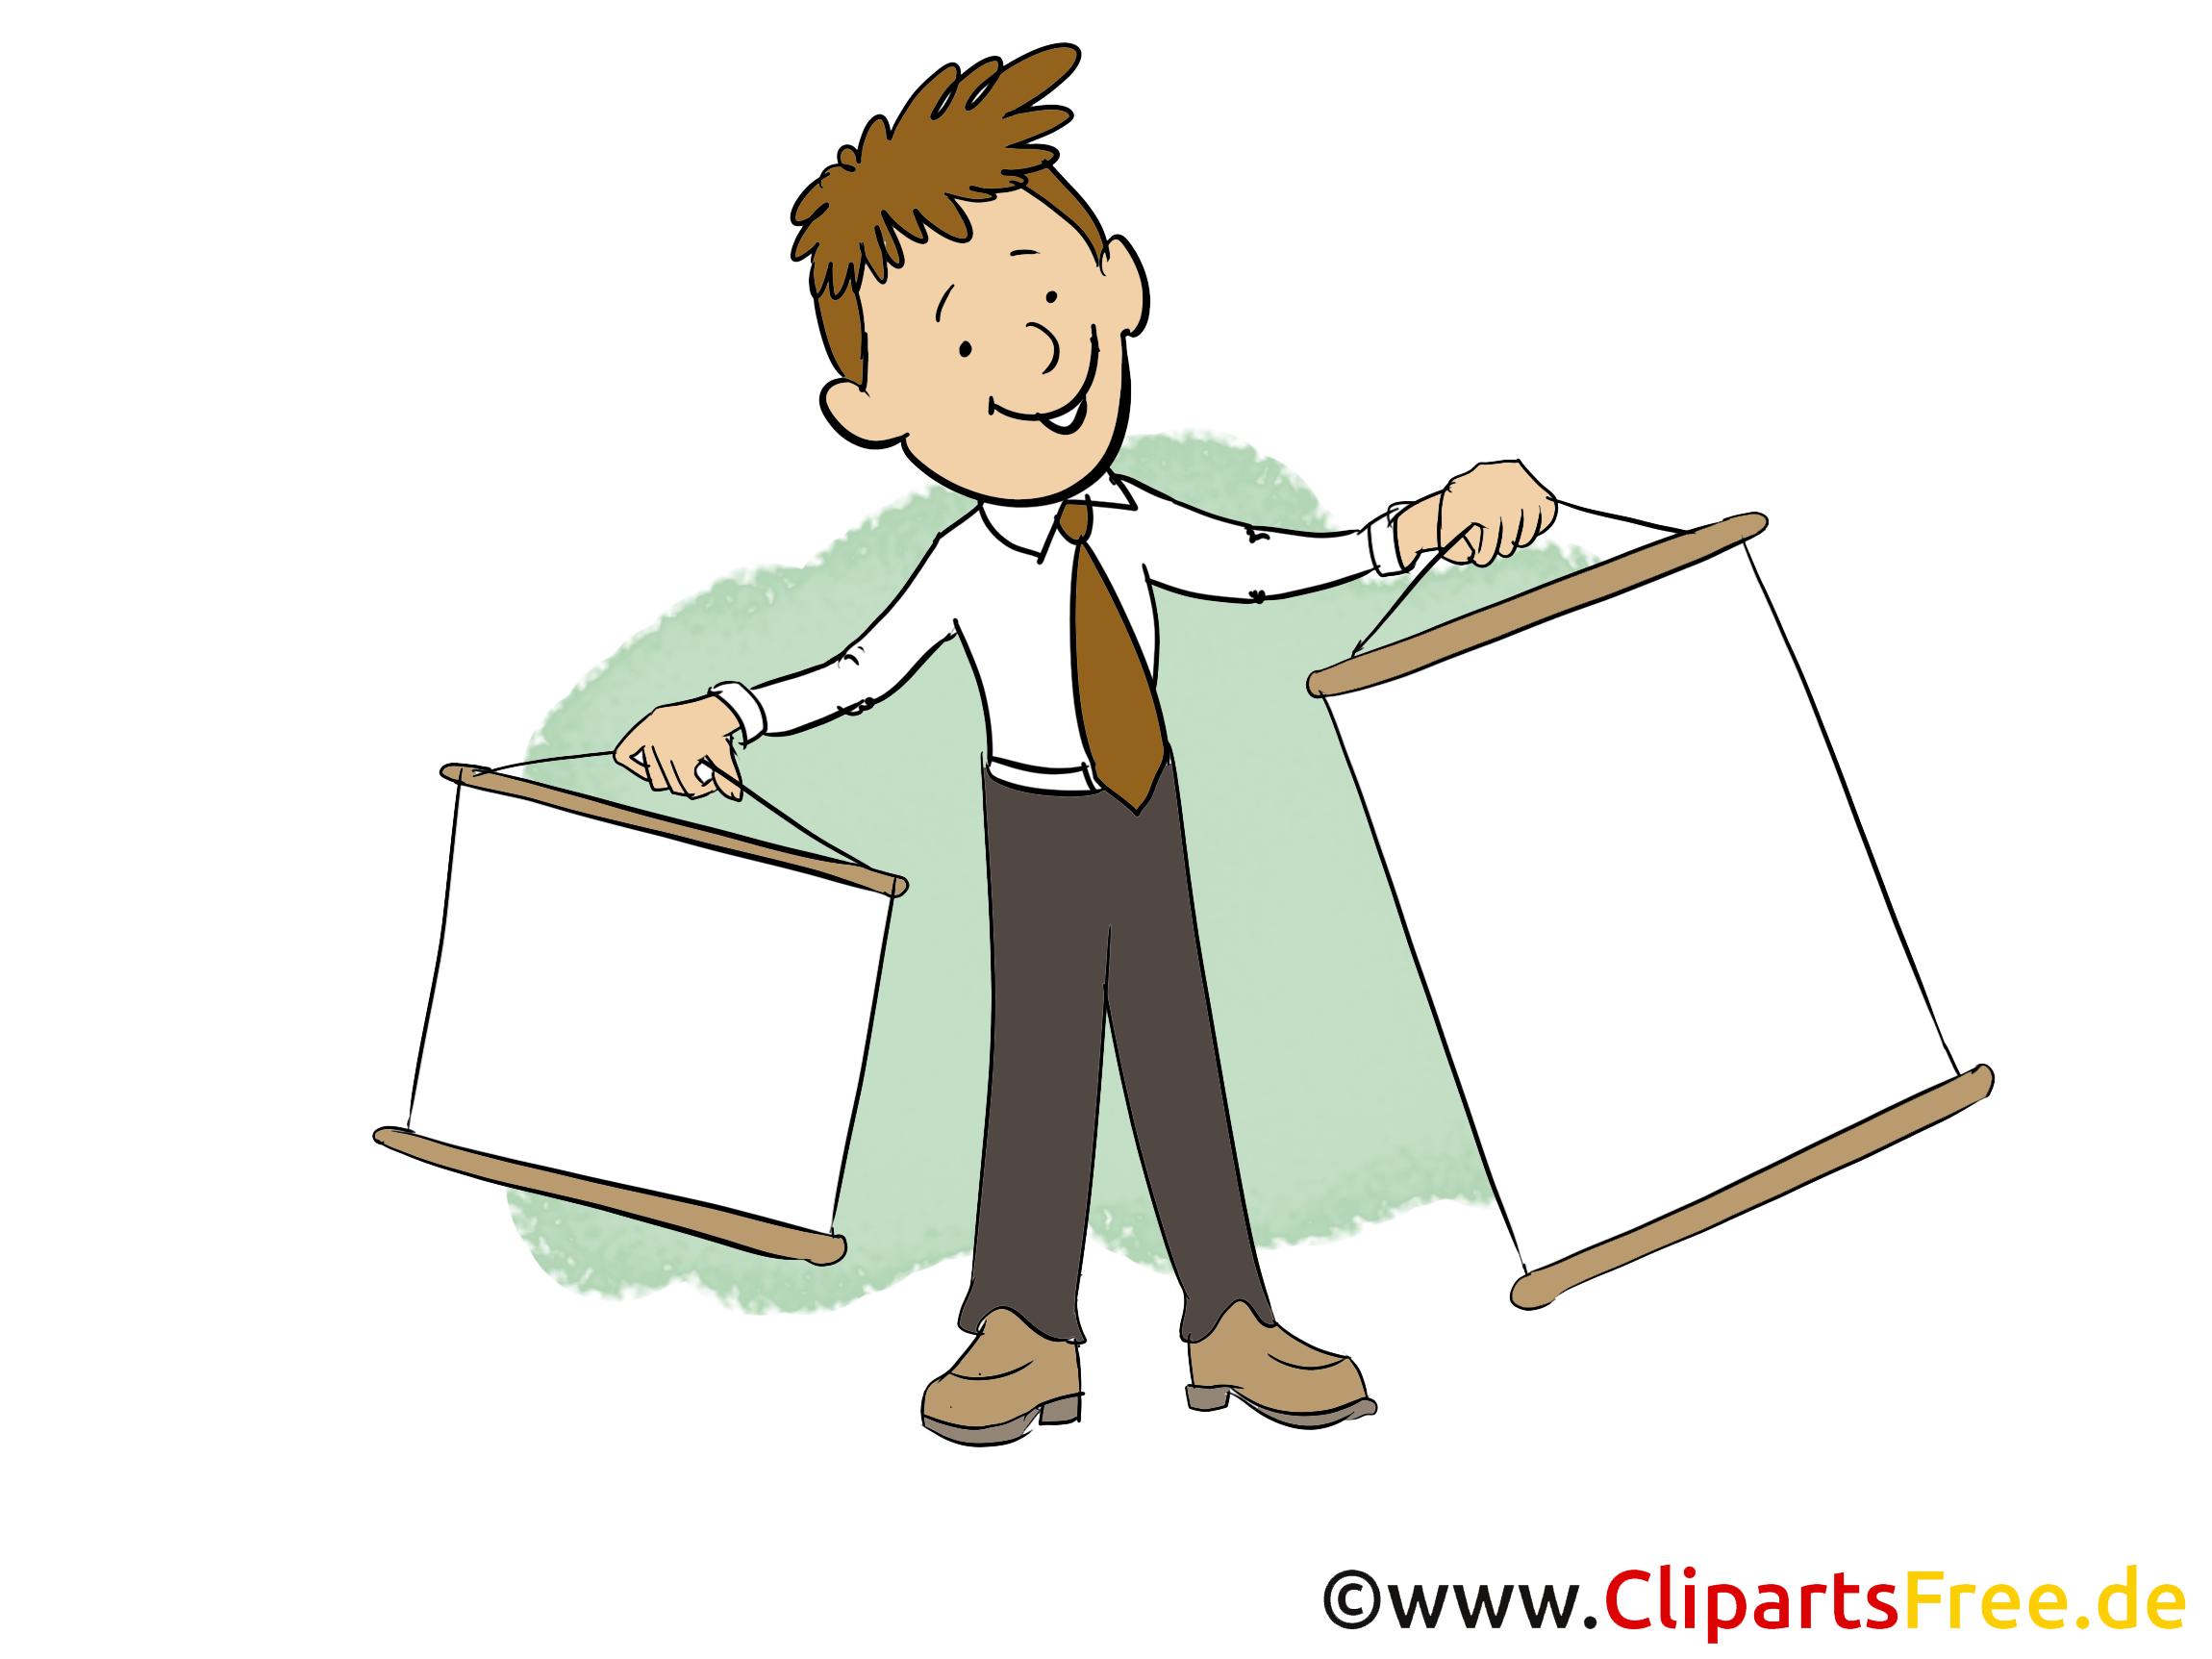 Bild mann clipart banner library download Office Clipart download Bilder, Cliparts, Cartoons, Grafiken ... banner library download